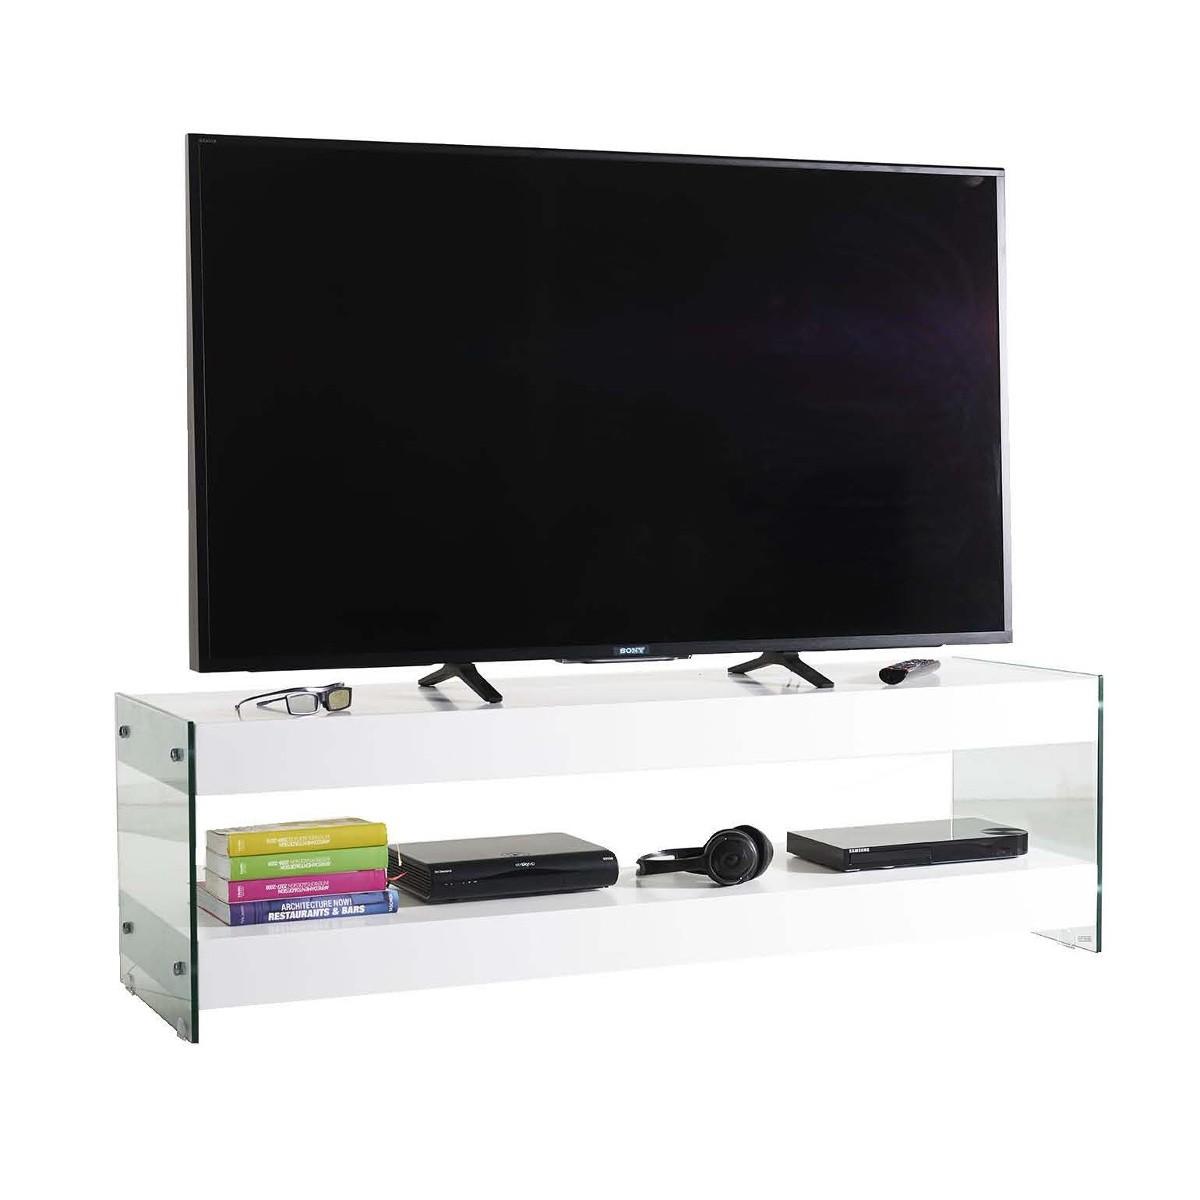 Mobili Porta Tv Moderni Bassi: Arredo mensole portatv porta tv base ...